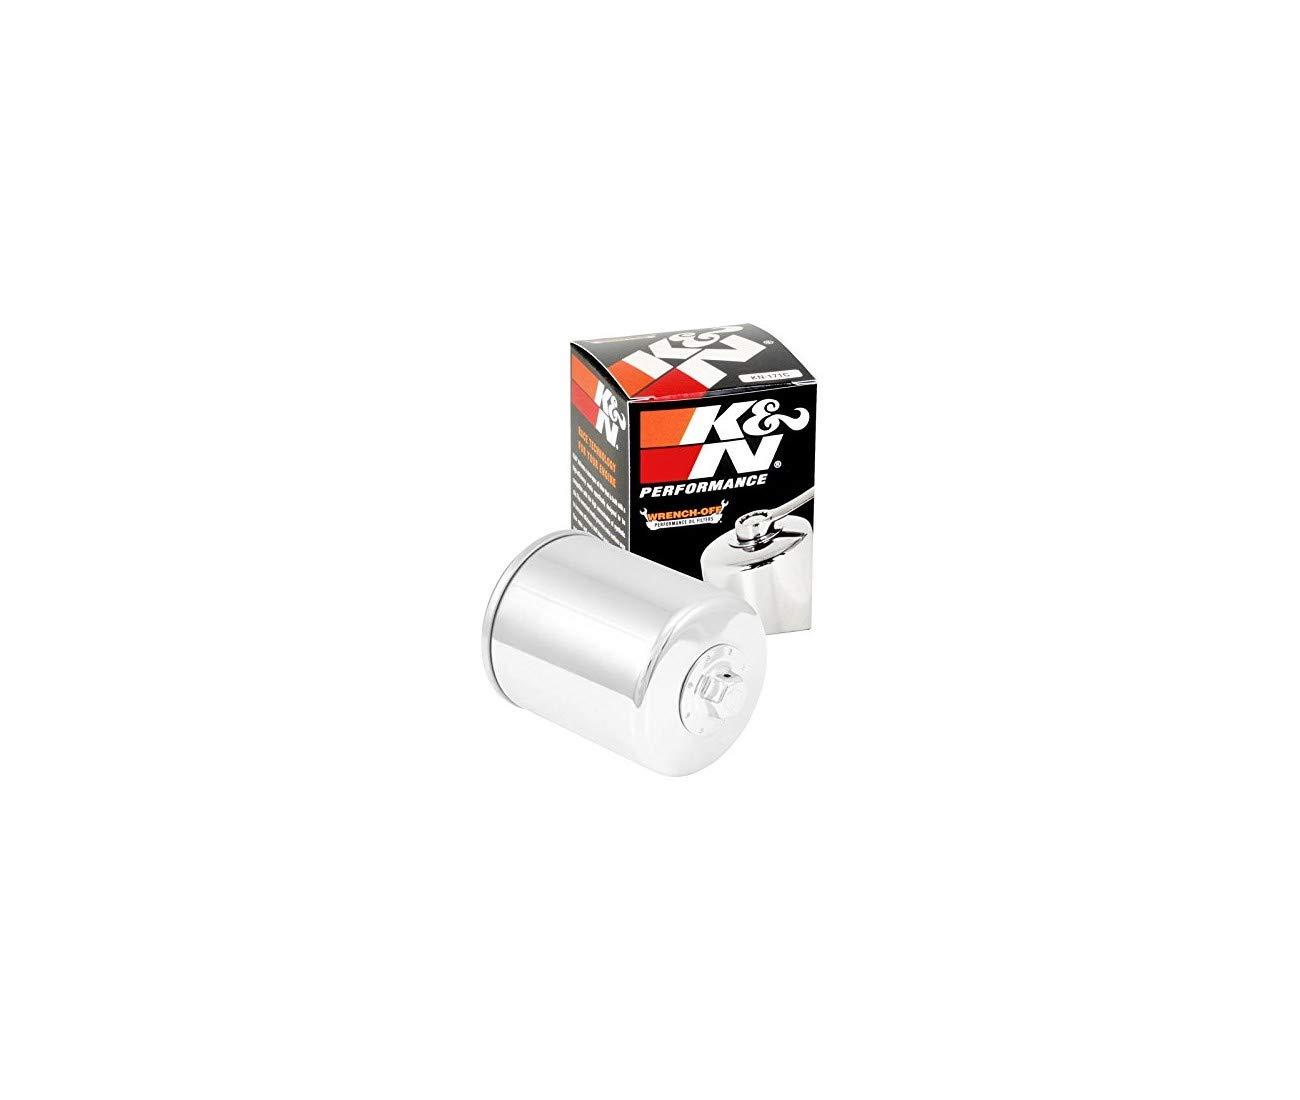 Harley-Davidson XL 883-1200/Sportster XL 1000/Filter KN-170//°C Oil